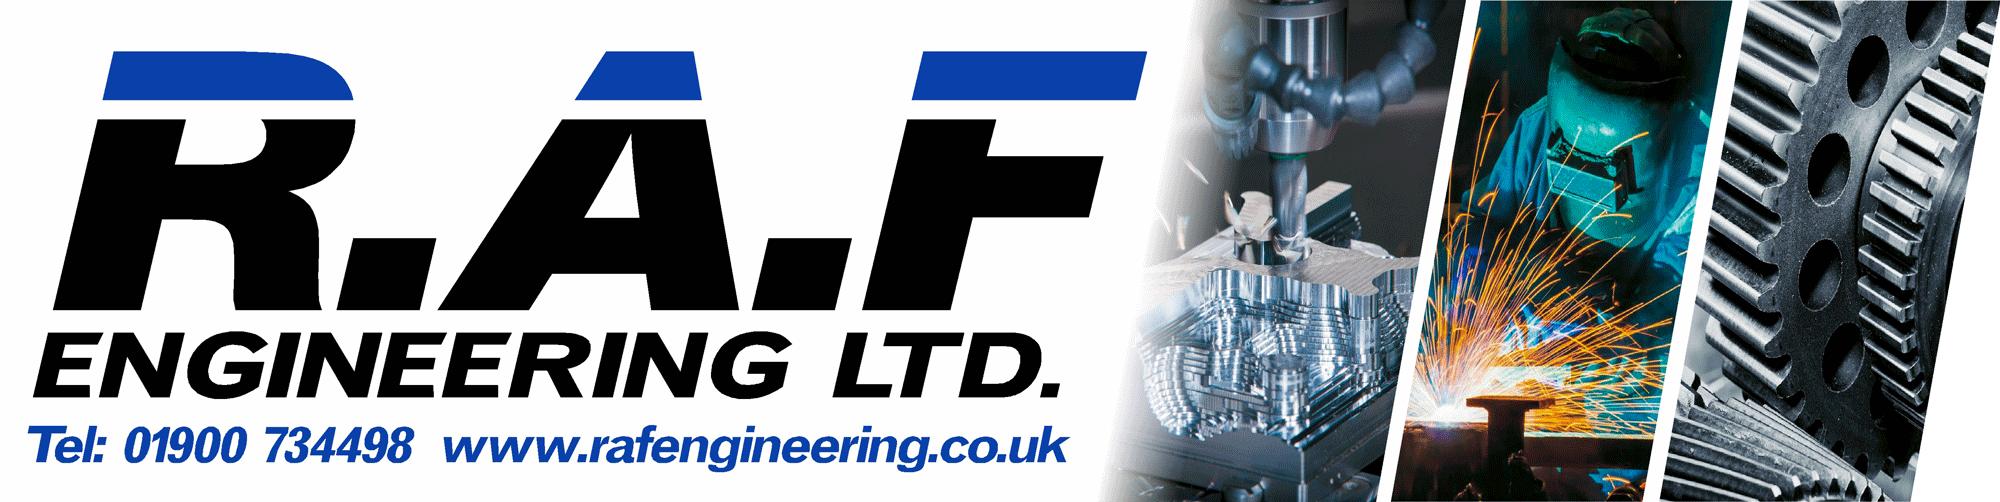 RAF Engineering